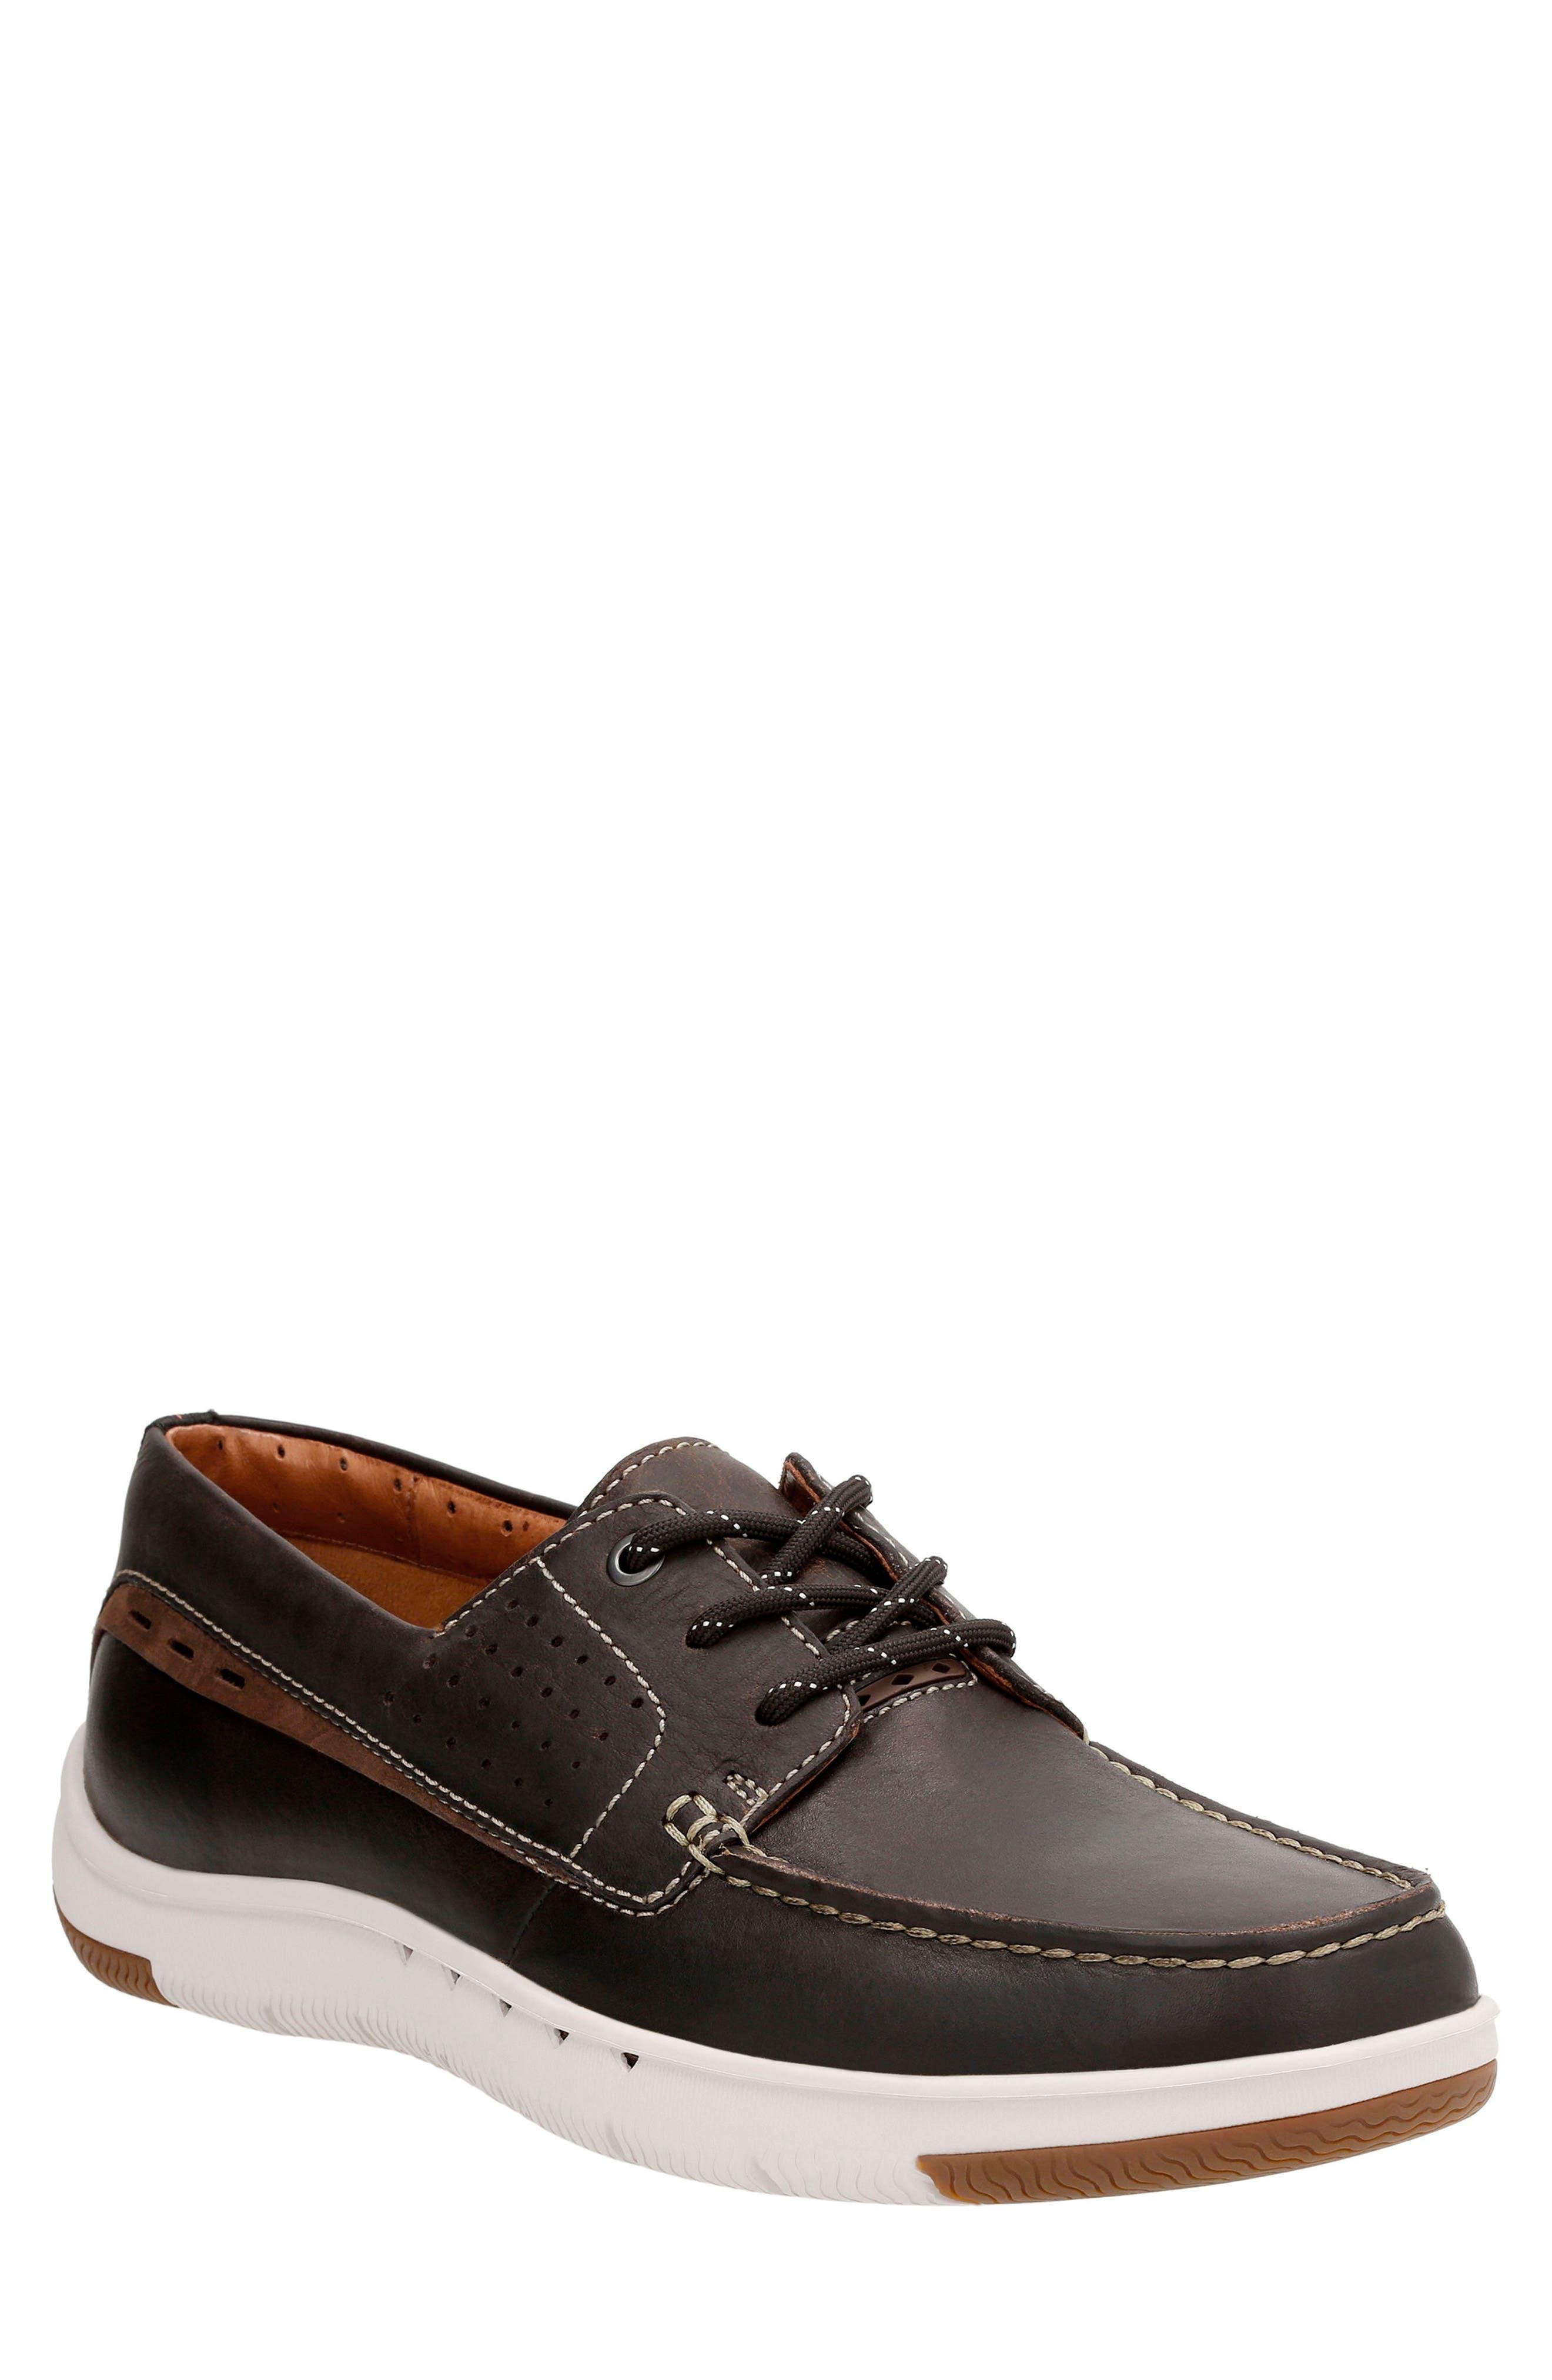 Main Image - Clarks® Un.Maslow Sneaker (Men)